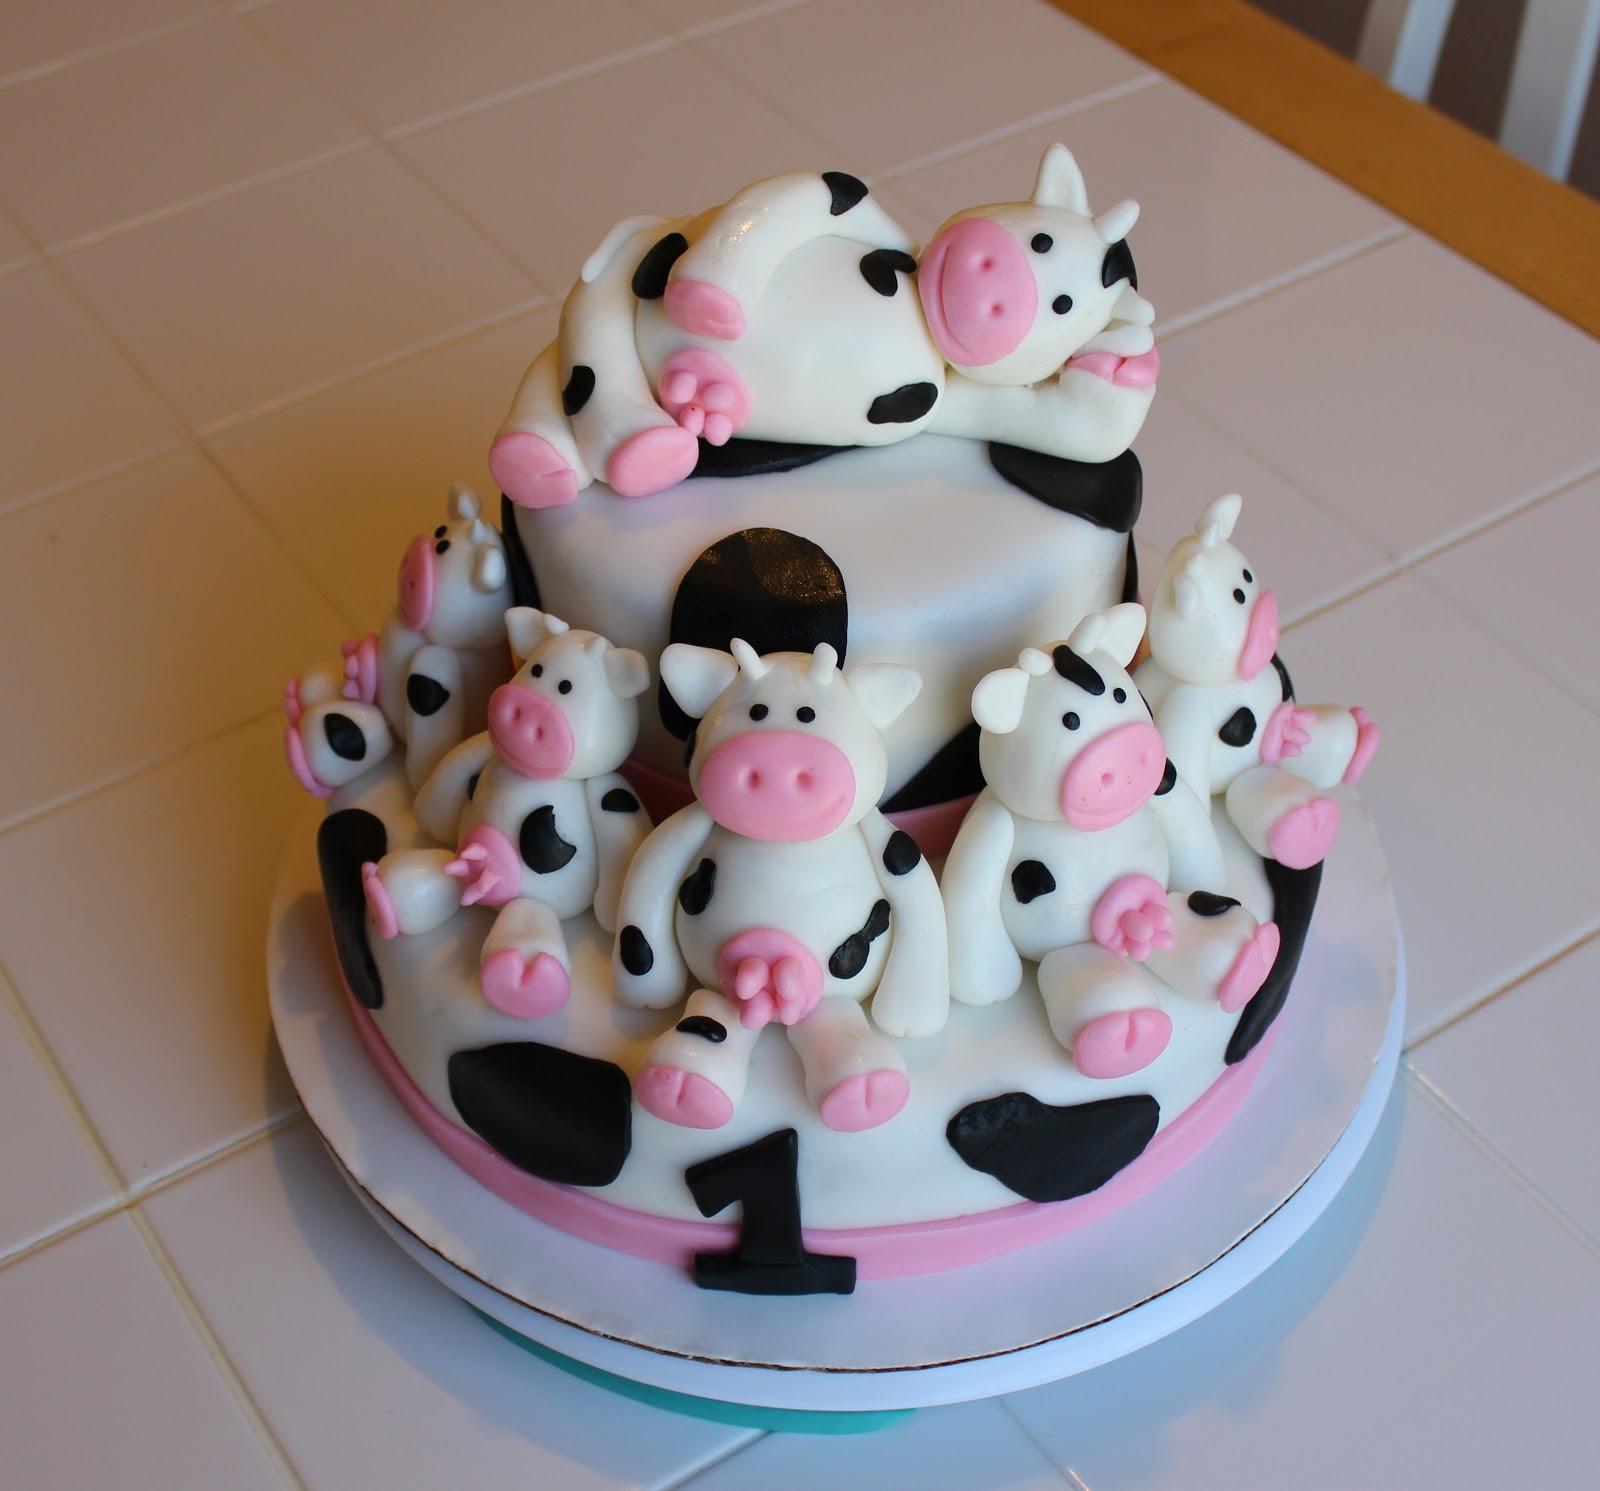 Bethanys Creative Pursuits Udderly Delightful Cow Cake